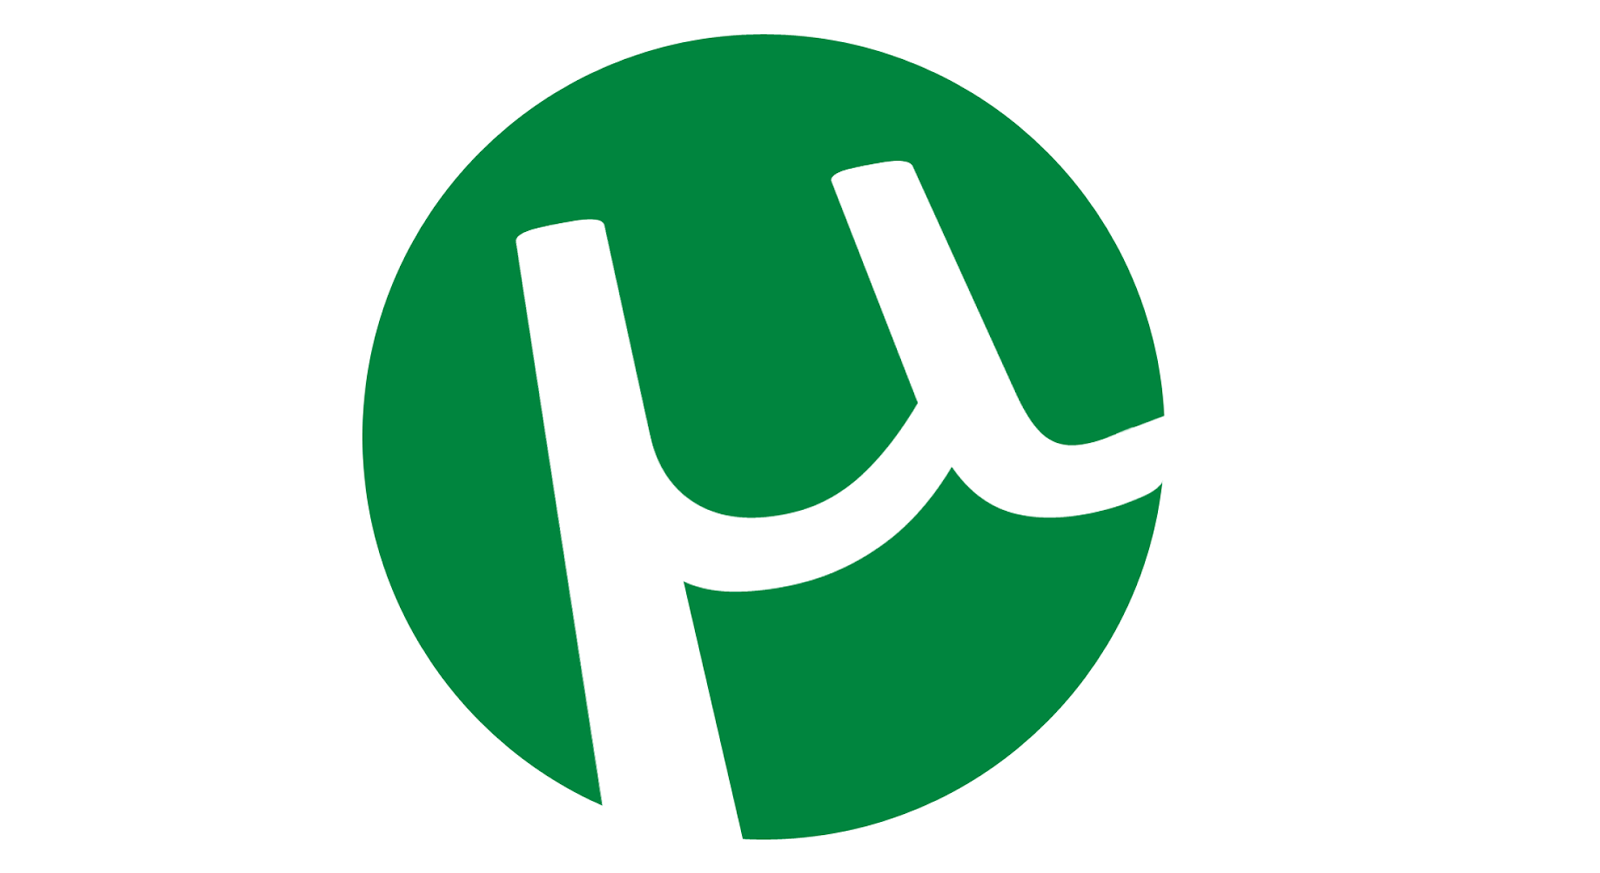 1356264406751_large_utorrent_logo_by_yupiax-d52ucpz.png